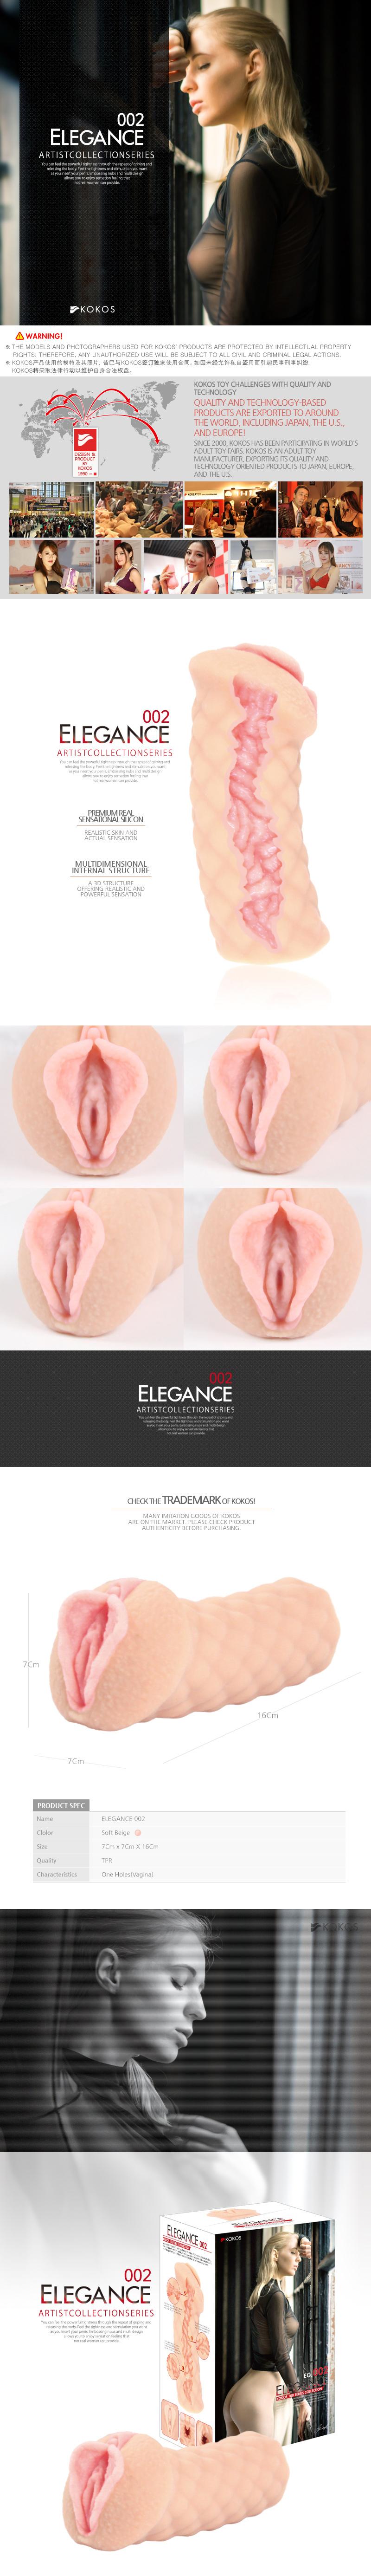 Elegance 002